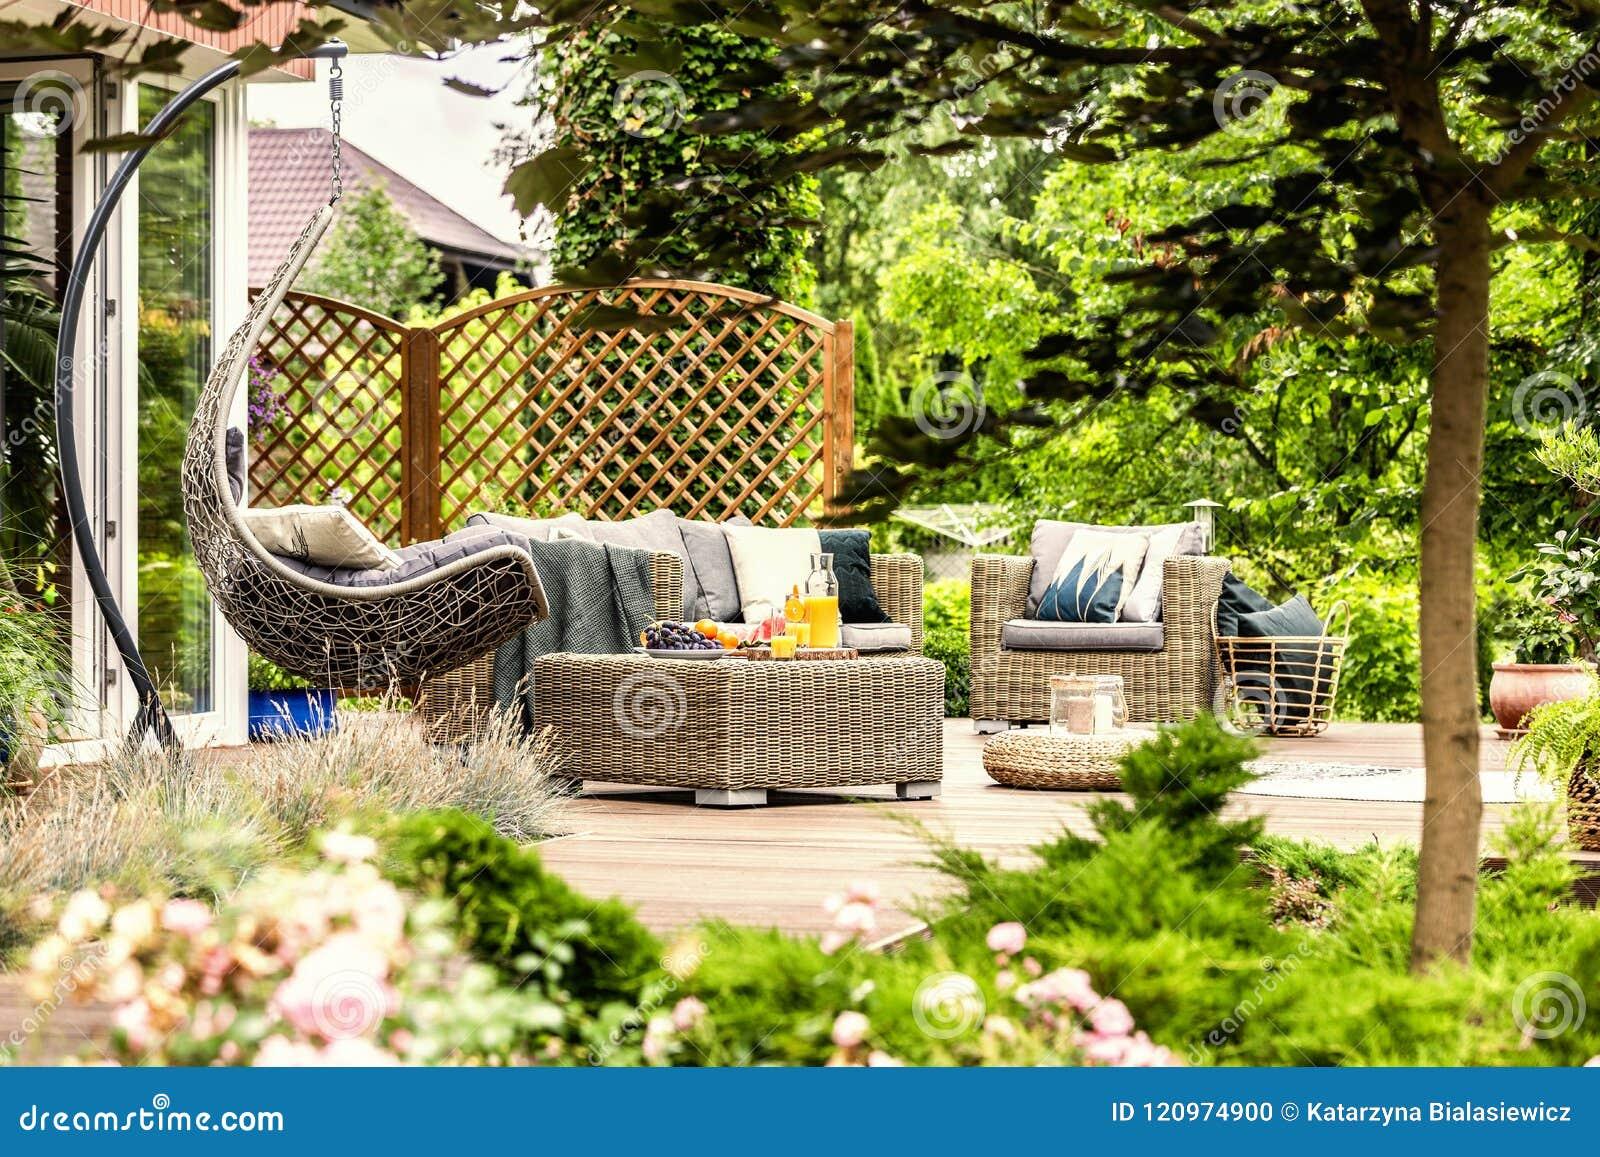 Marvelous Rattan Garden Furniture And Hanging Chair On Wooden Terrace Download Free Architecture Designs Ferenbritishbridgeorg